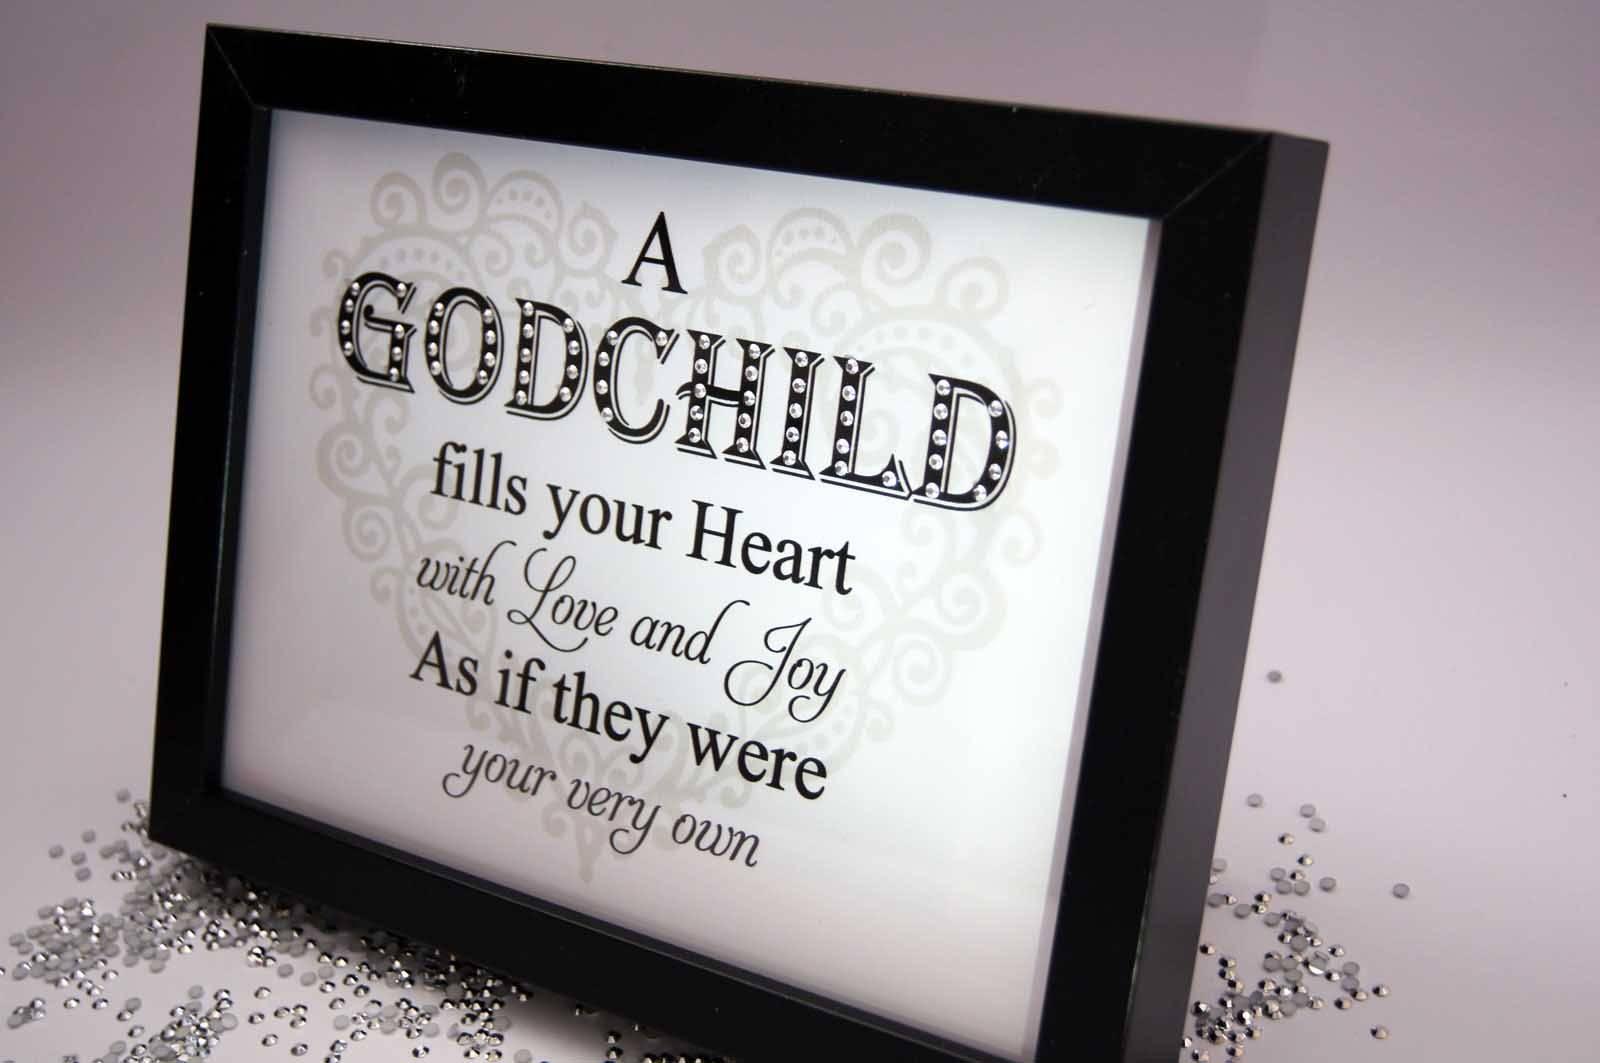 A Godchild Fills Your